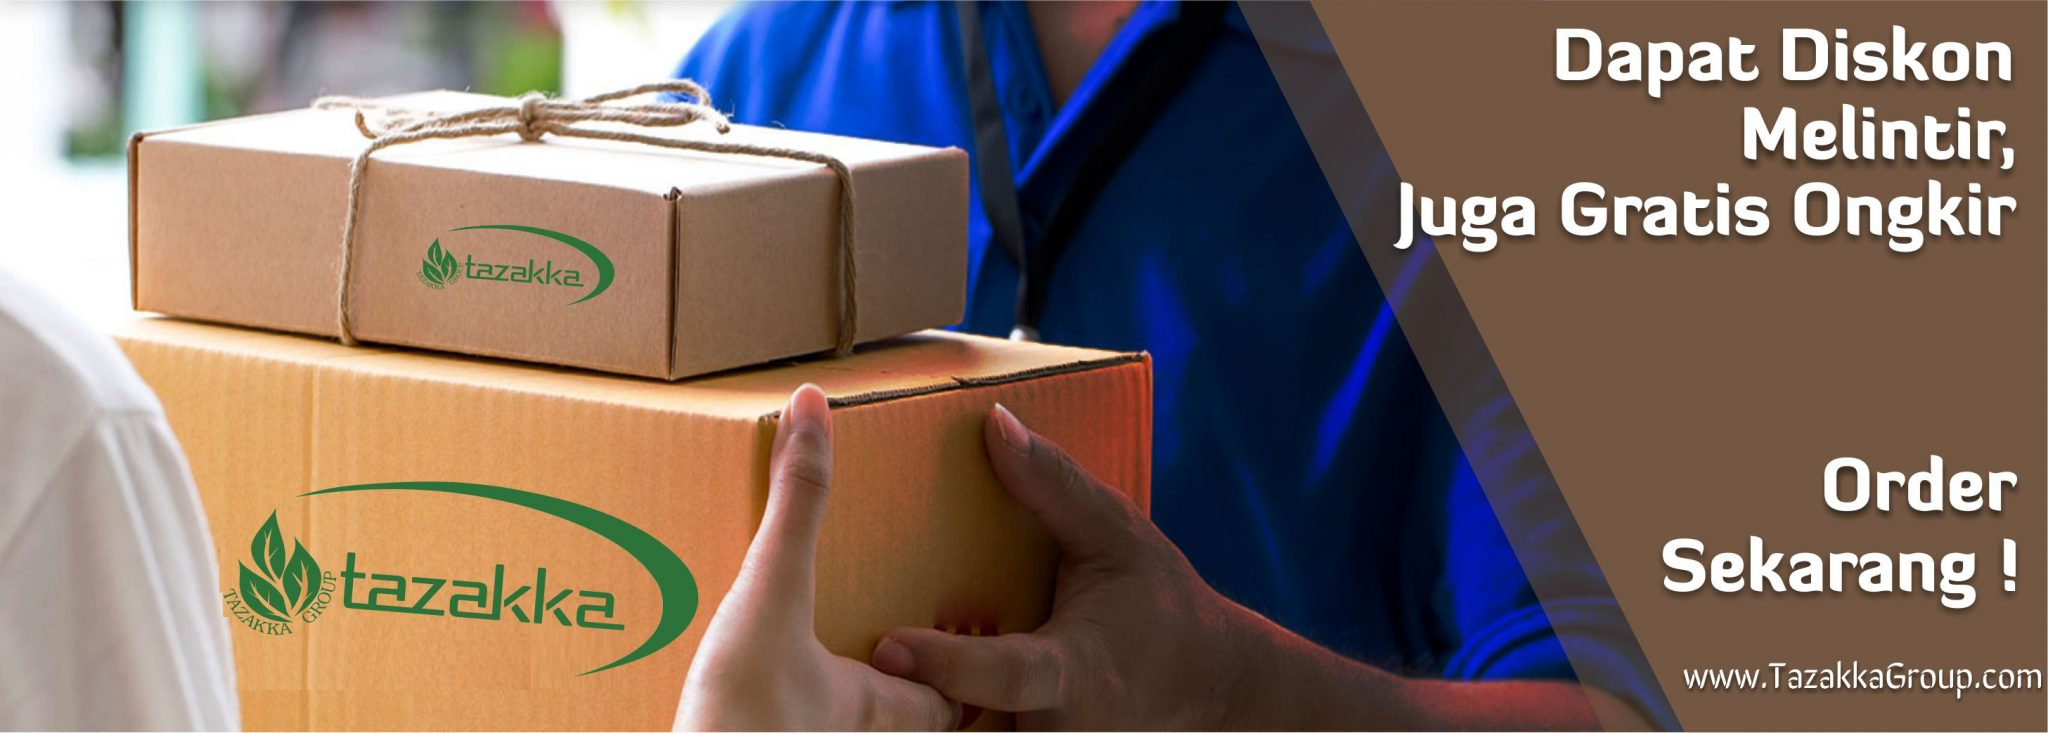 contoh foto gambar banner layanan jasa pengiriman paket gratis free ongkir